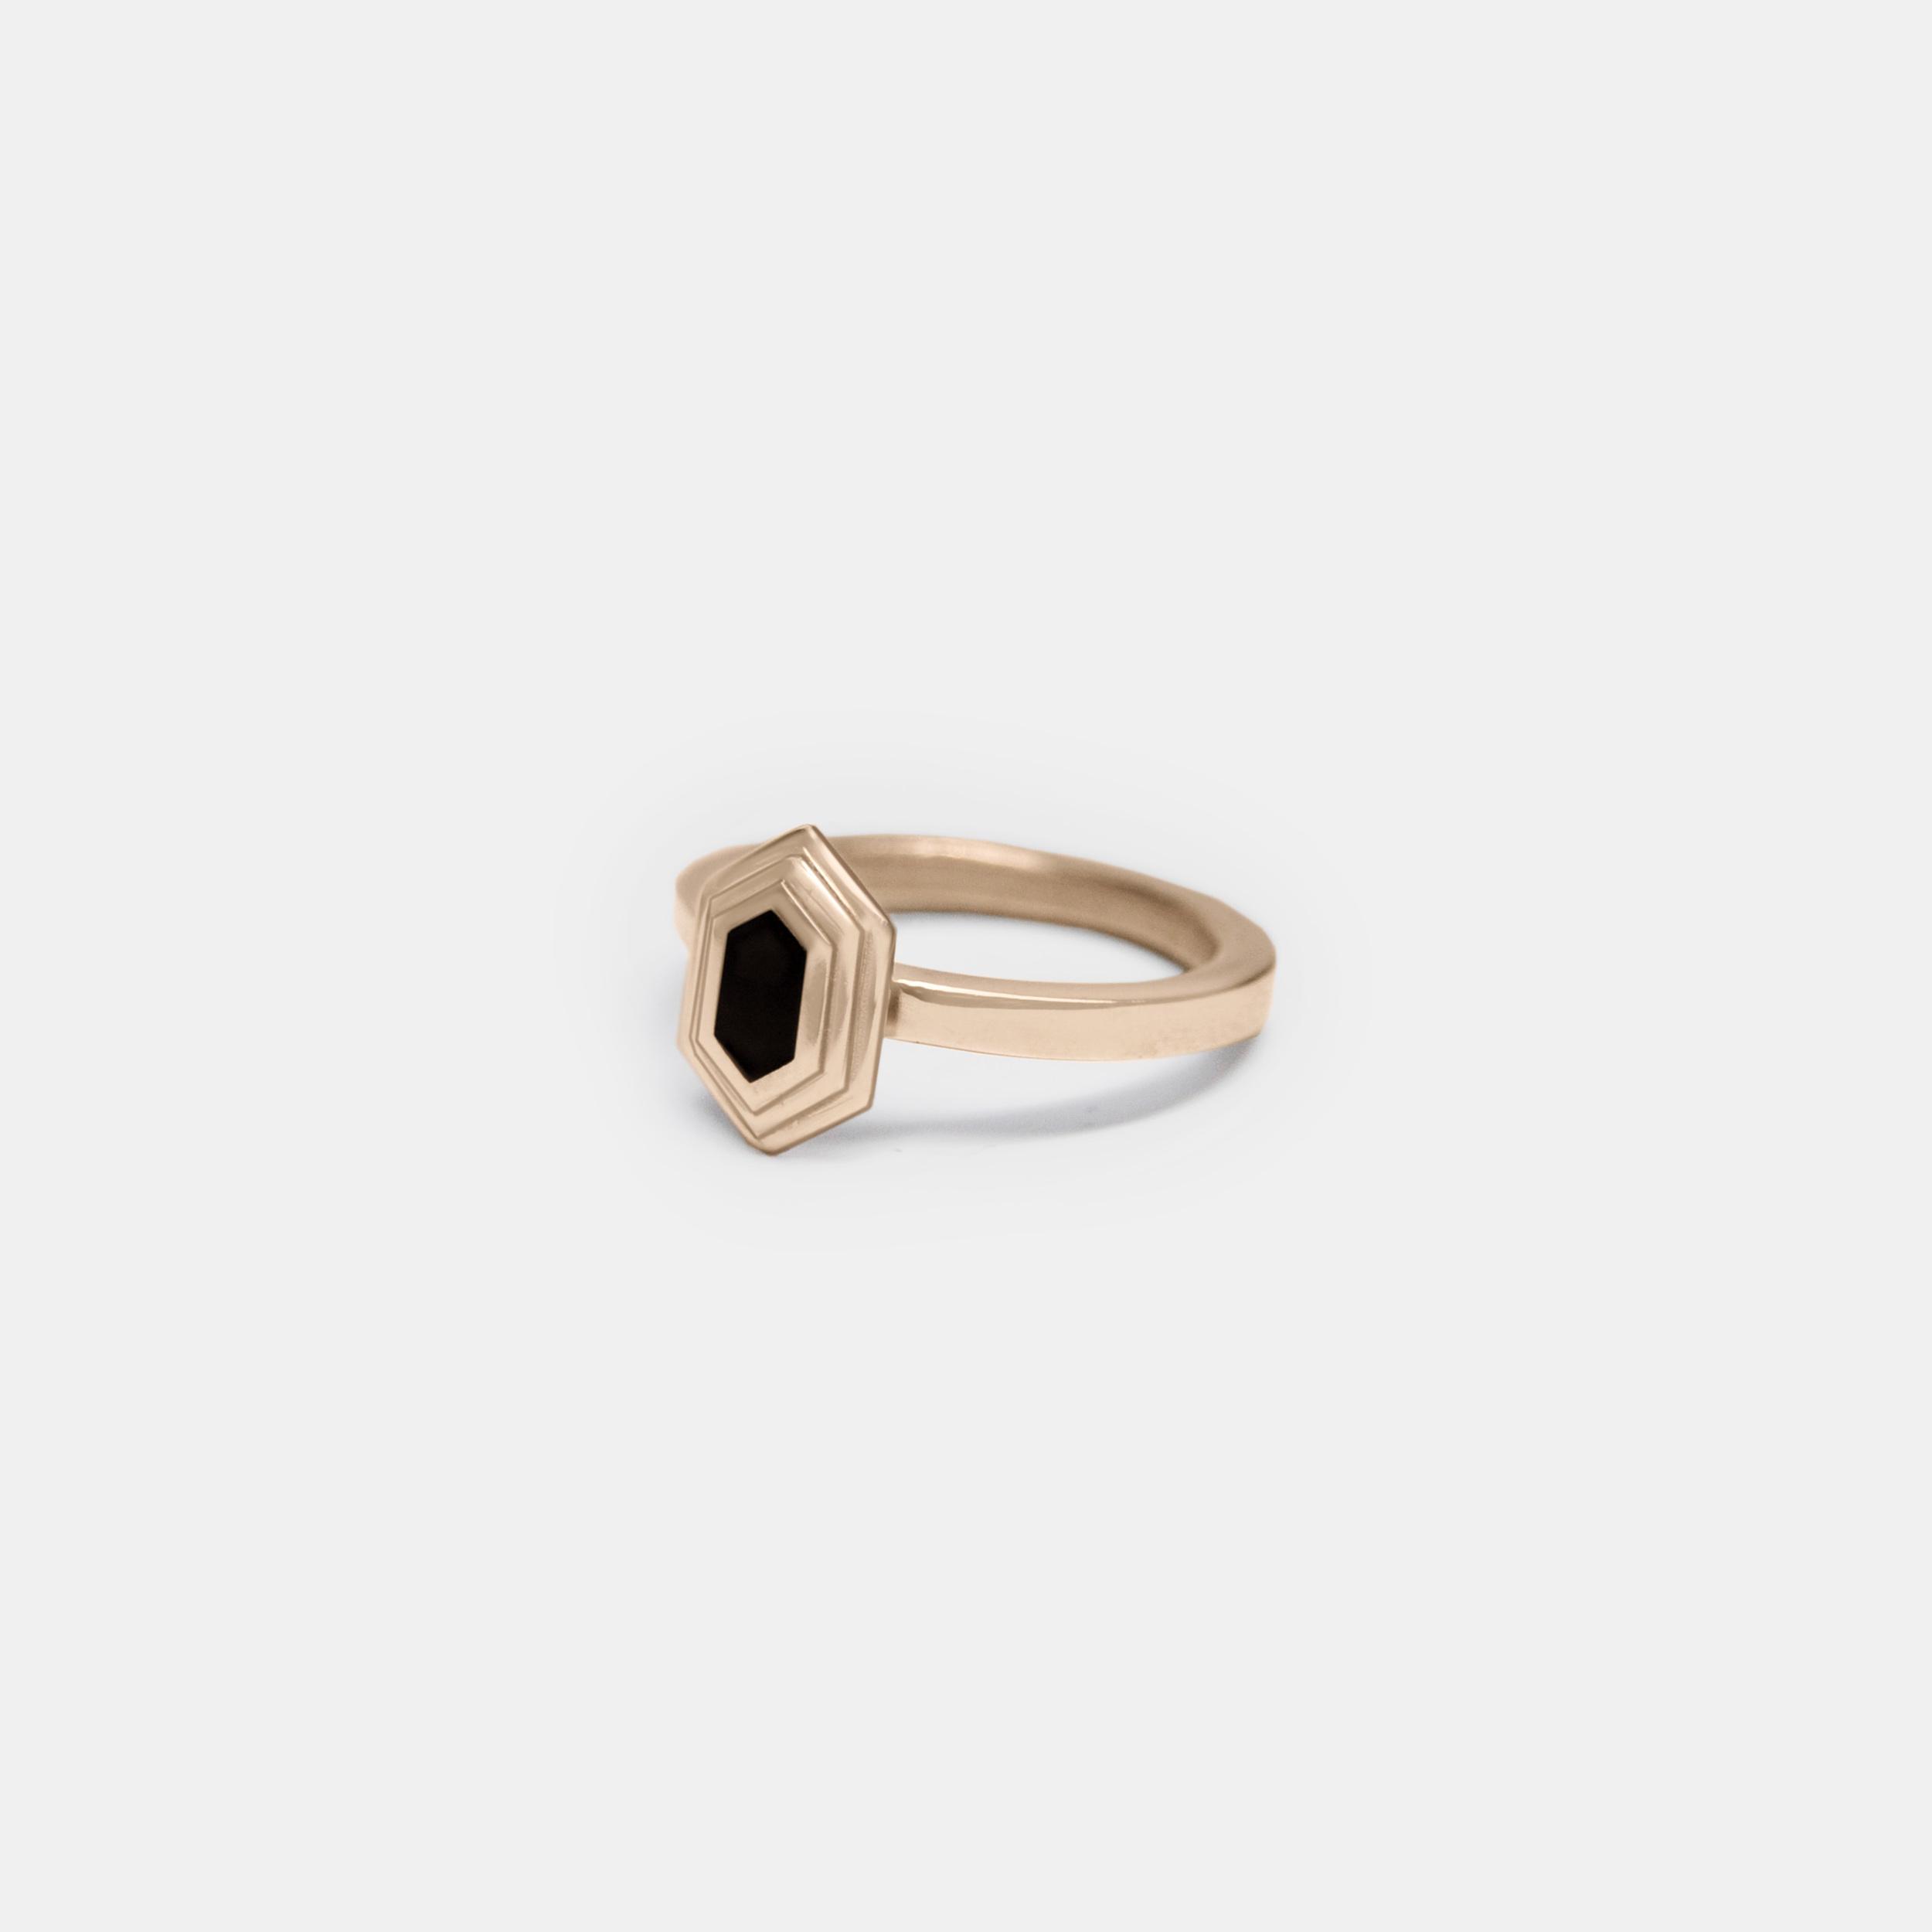 Marisa-Lomonaco-Custom-Jewelry-Hudson-Valley_0003_Axis-Ring-Bronze-Black.jpg